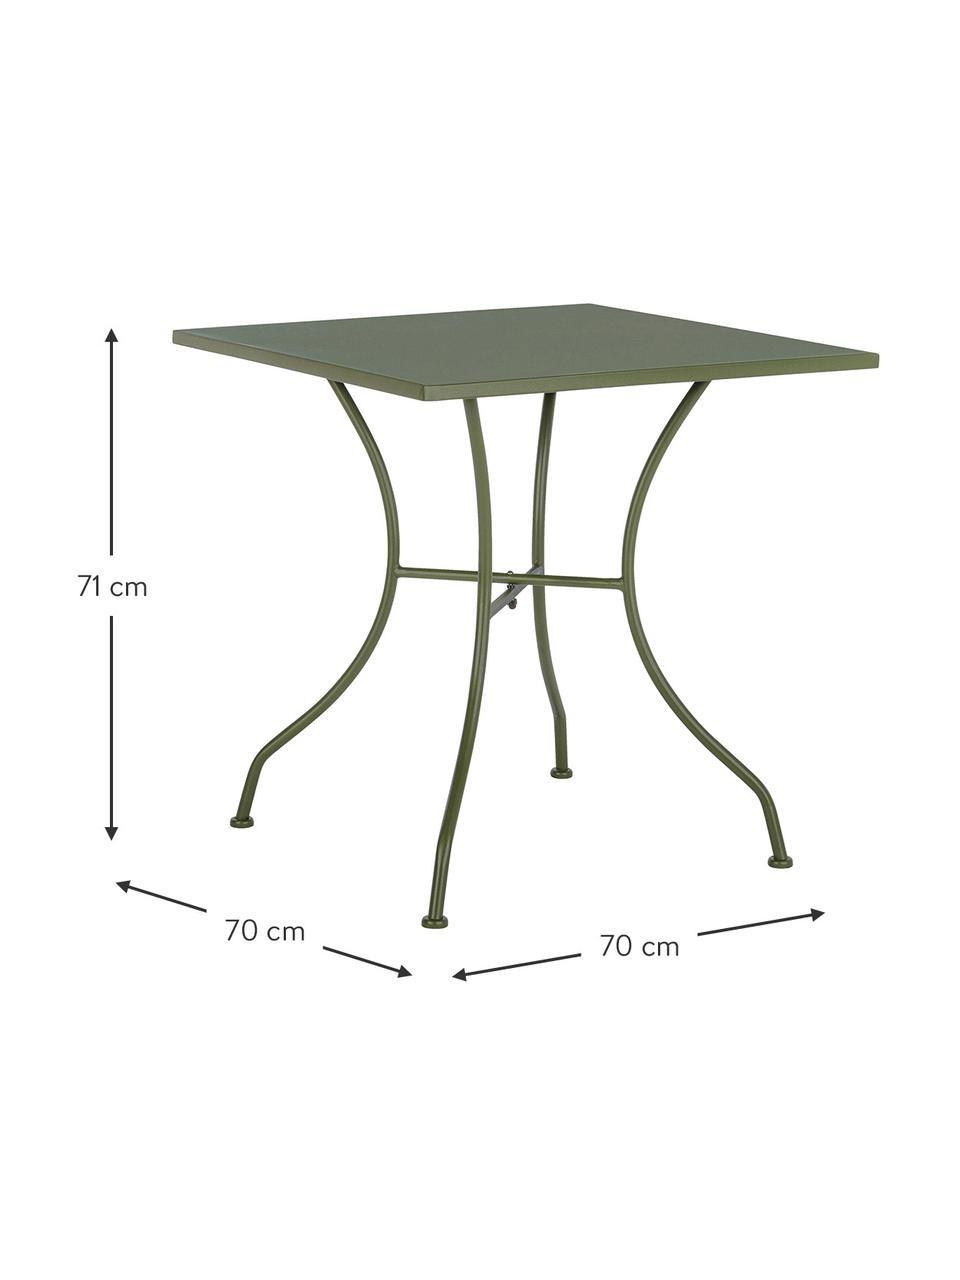 Tavolino da giardino in metallo Kelsie, Acciaio verniciato, Verde, Larg. 70 x Alt. 70 cm